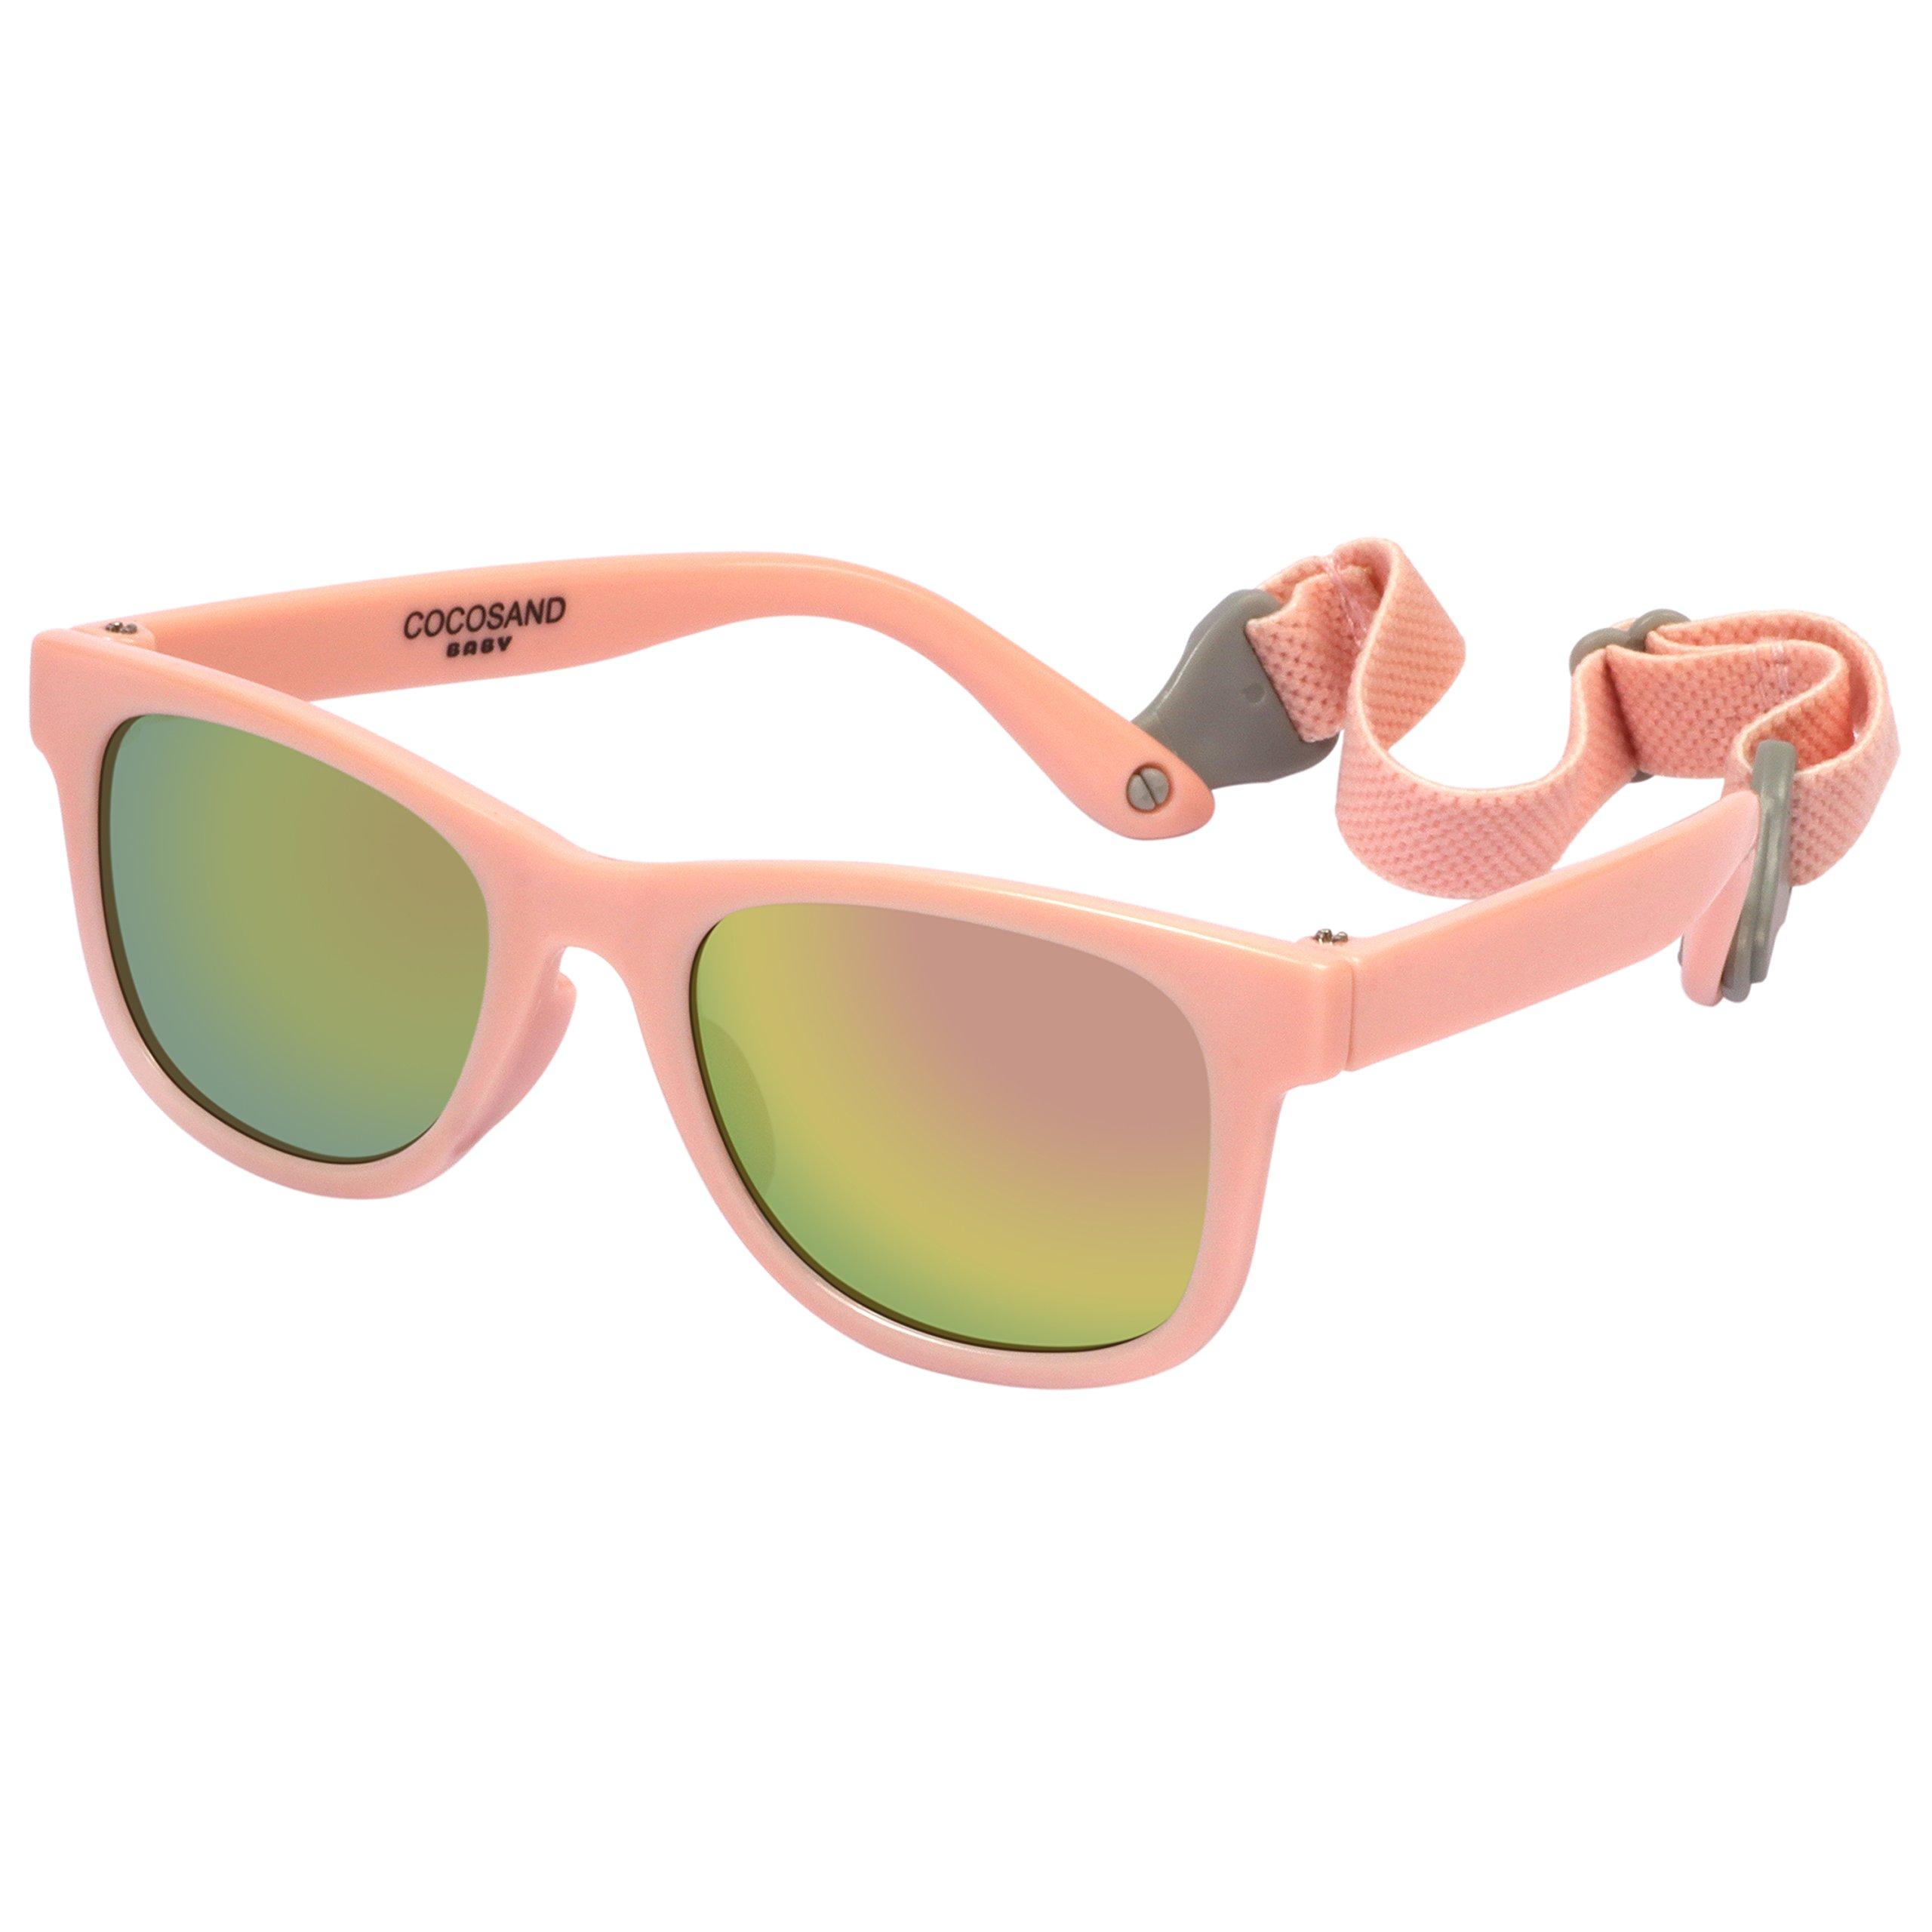 COCOSAND Navigator Toddler Sunglasses 0 24months